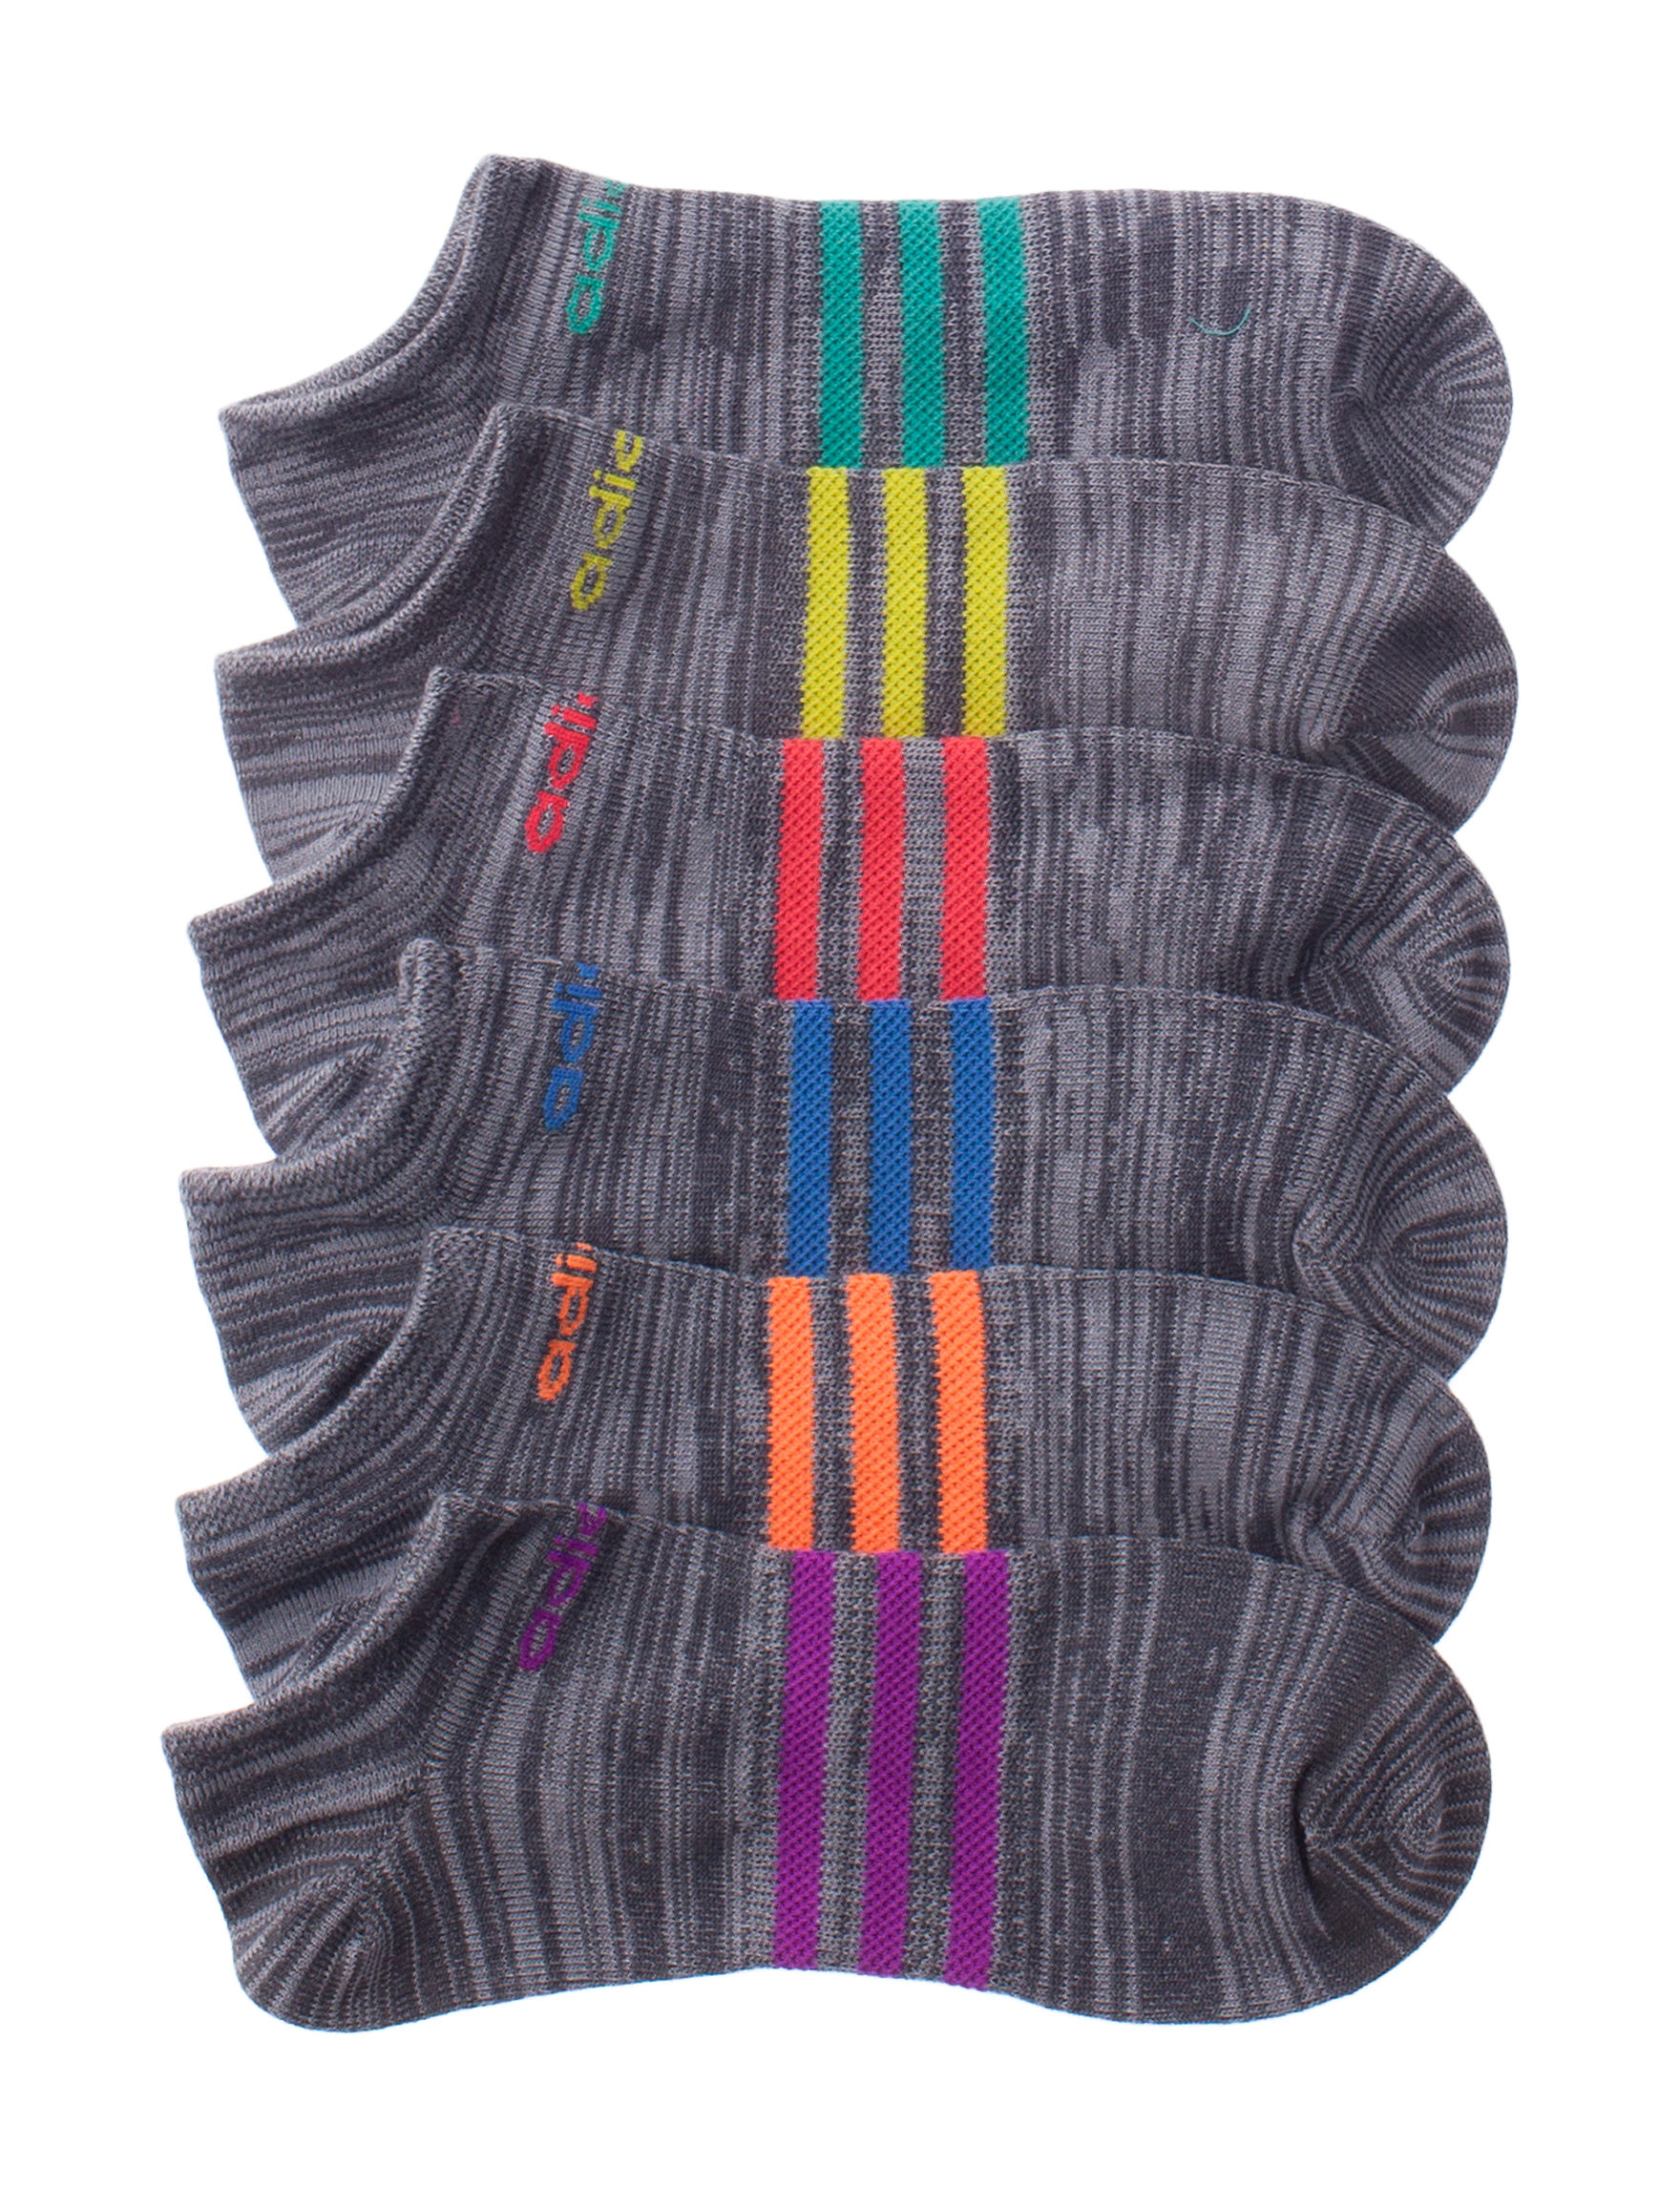 Adidas Grey Multi Socks